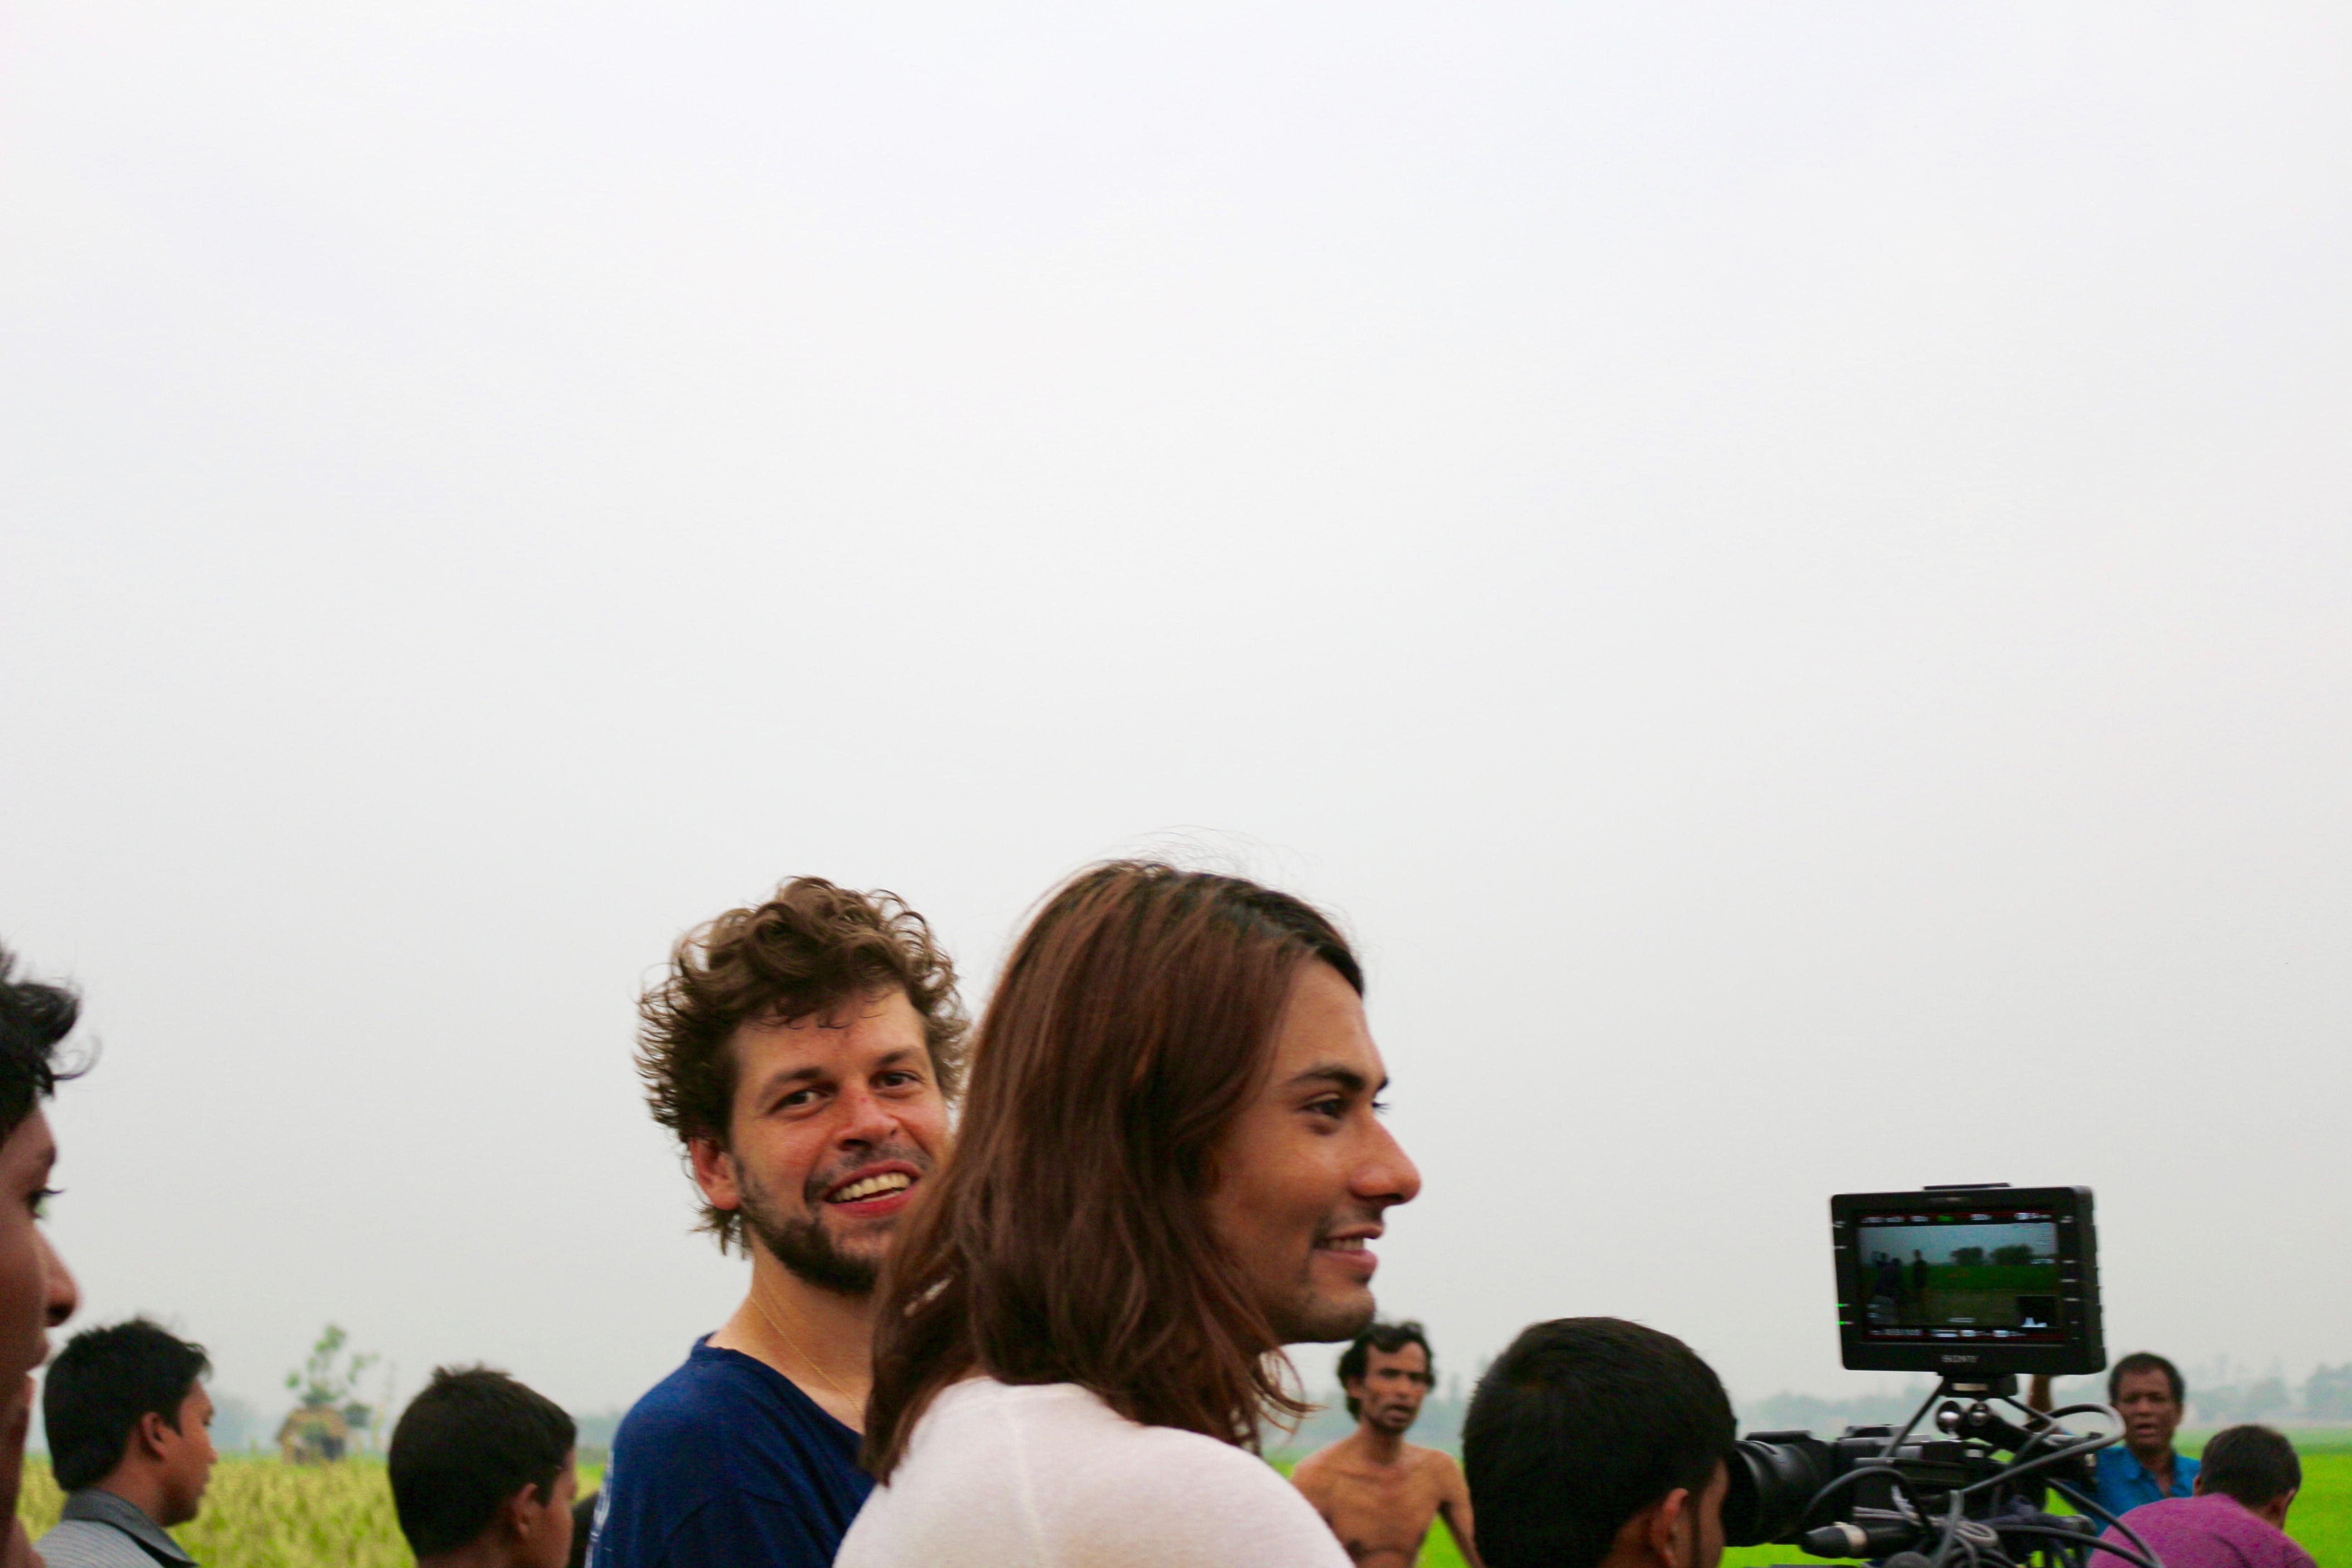 Saud Jubaer & Yann Seweryn